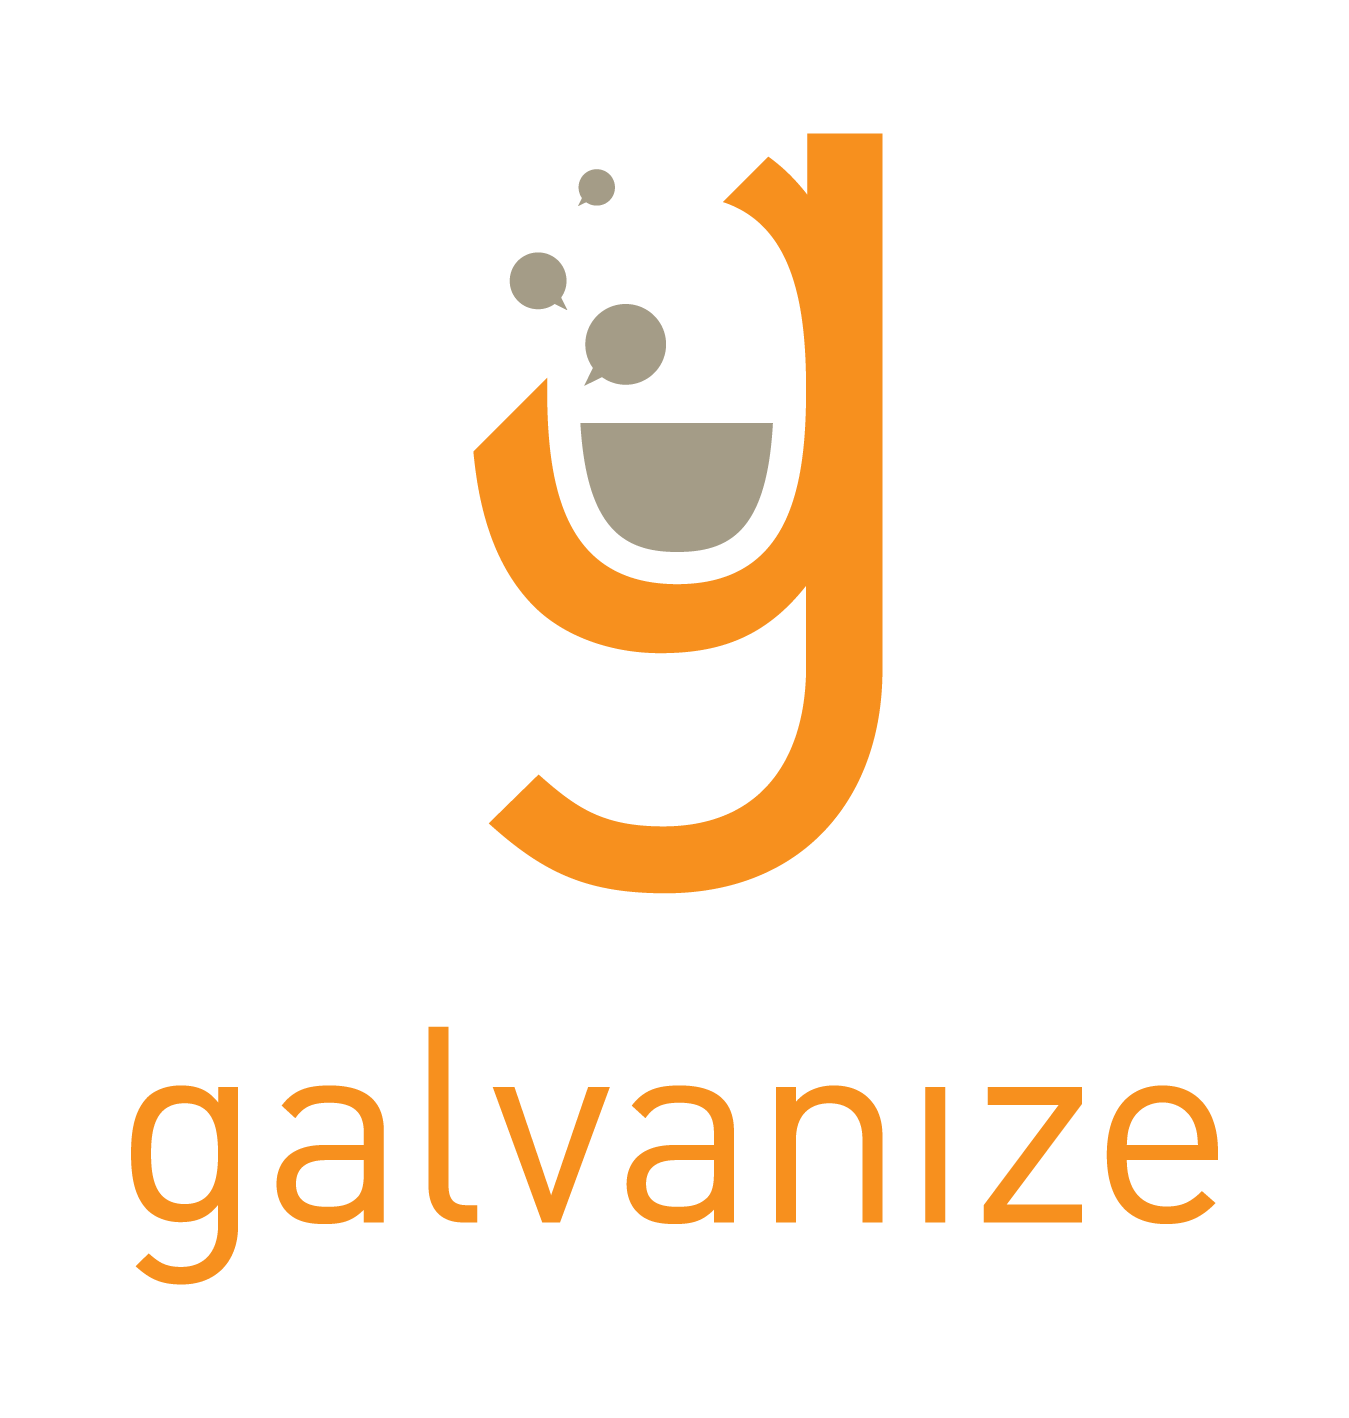 Galvanize---Galvanize-Logo---Text-_-Logo.png